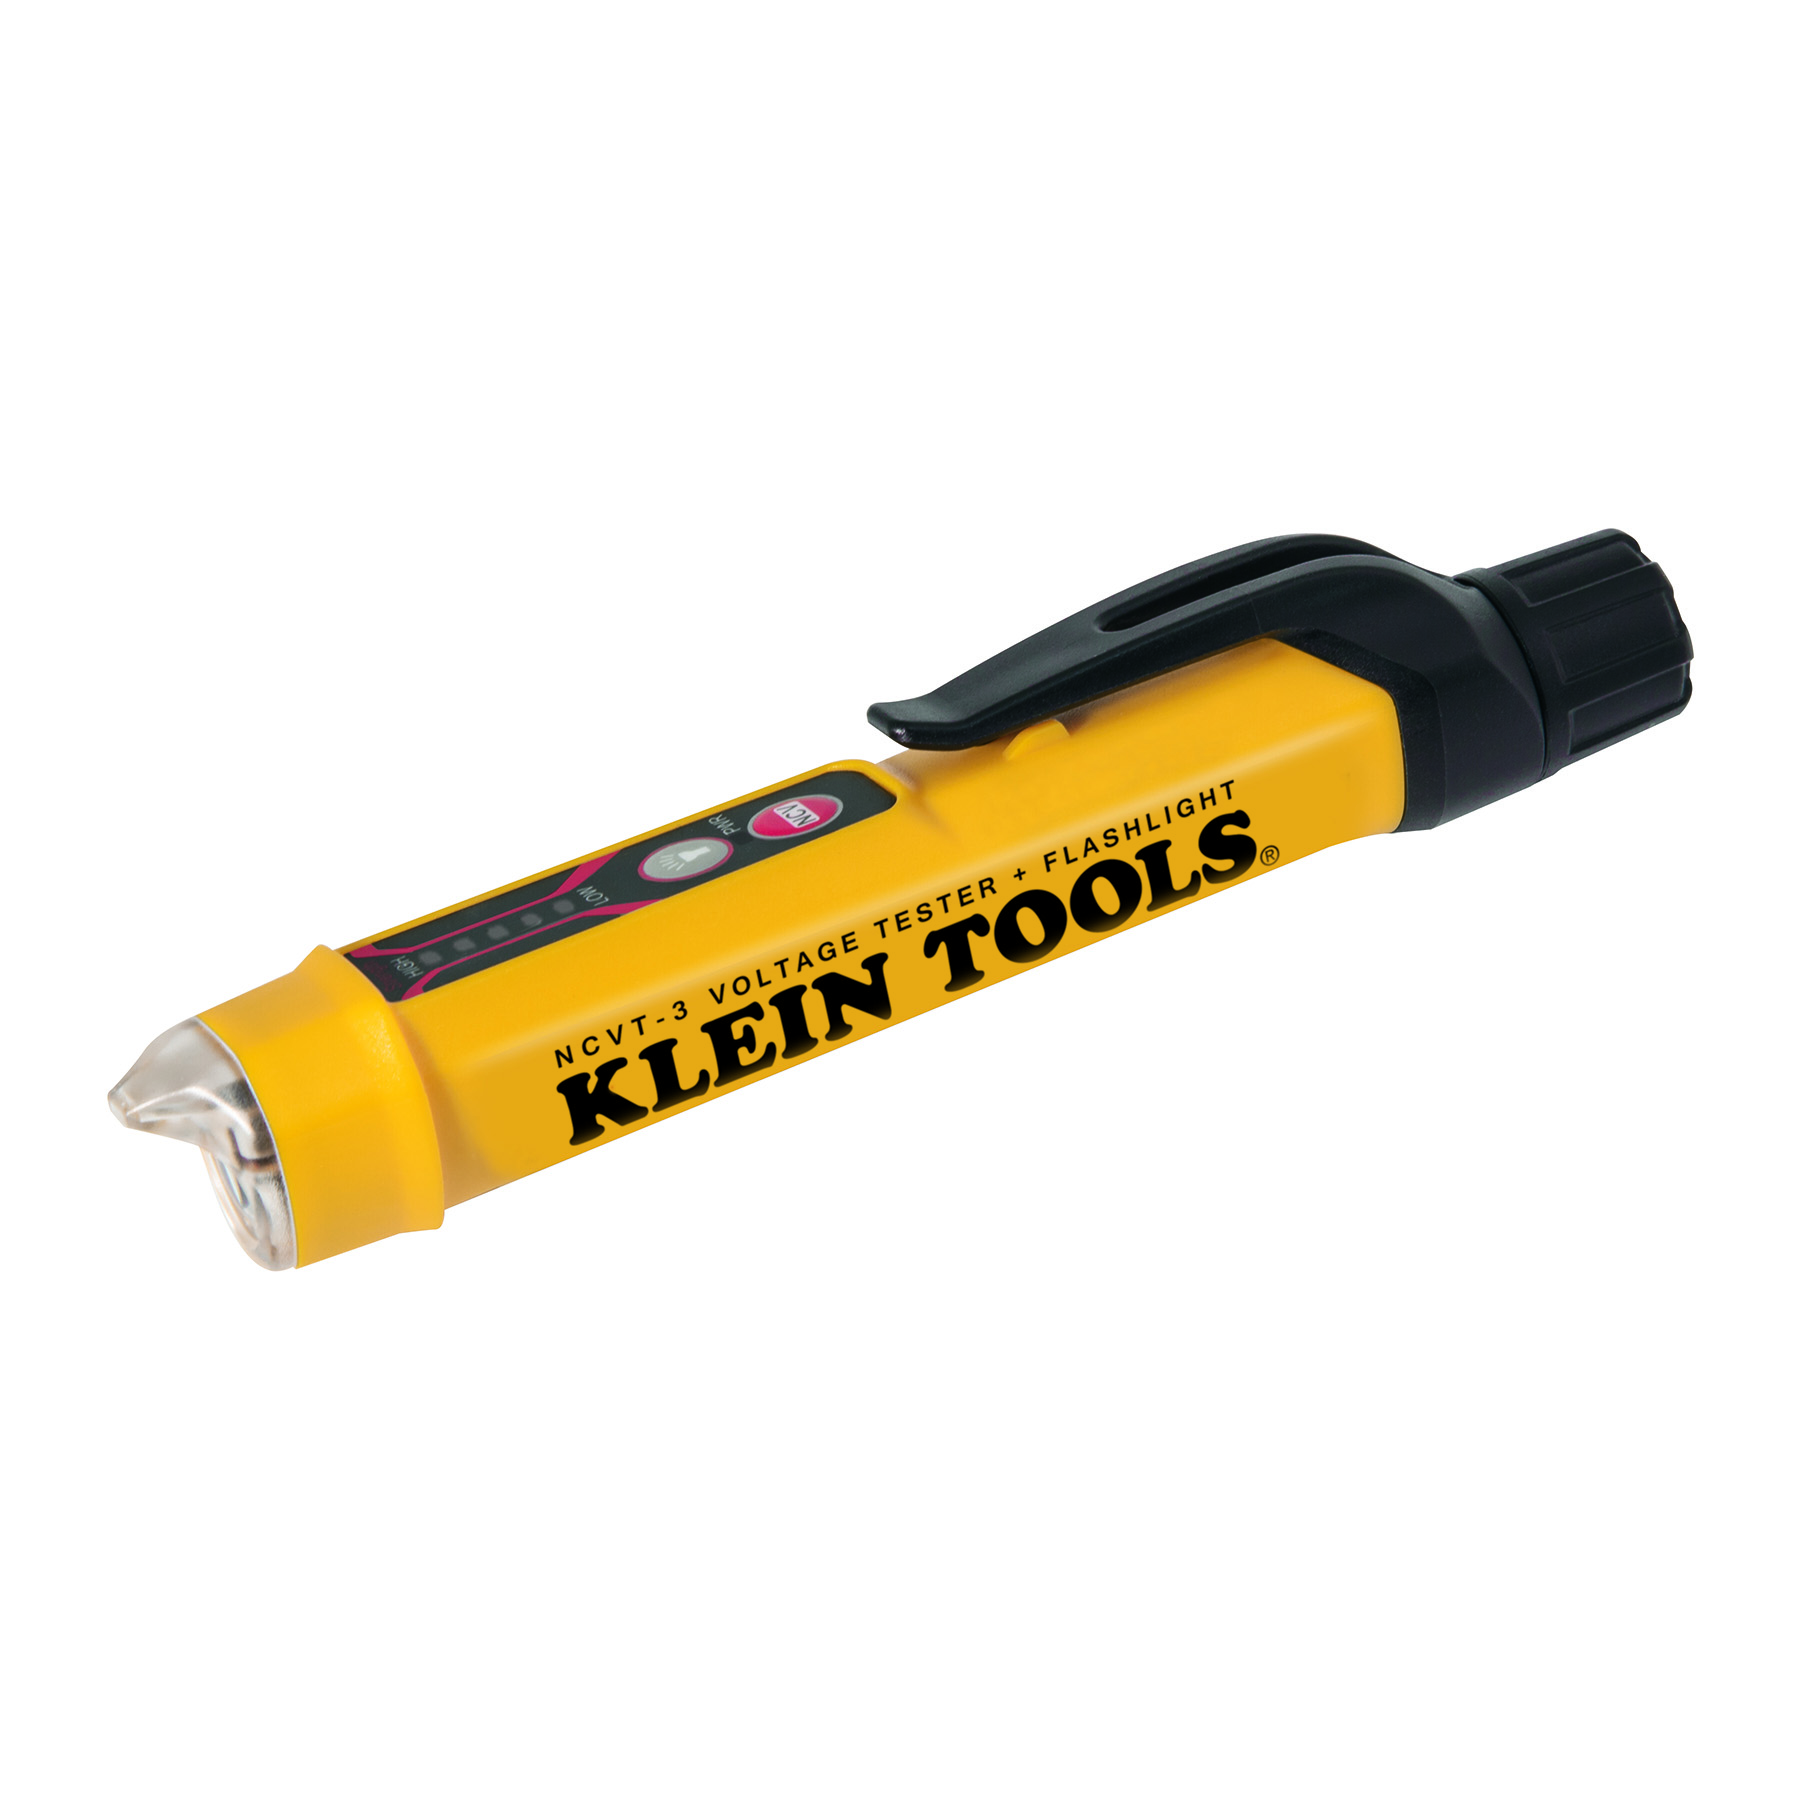 Klein Tools NCVT-3 Non-Contact Voltage Tester with Flashlight 92644690082 | eBay